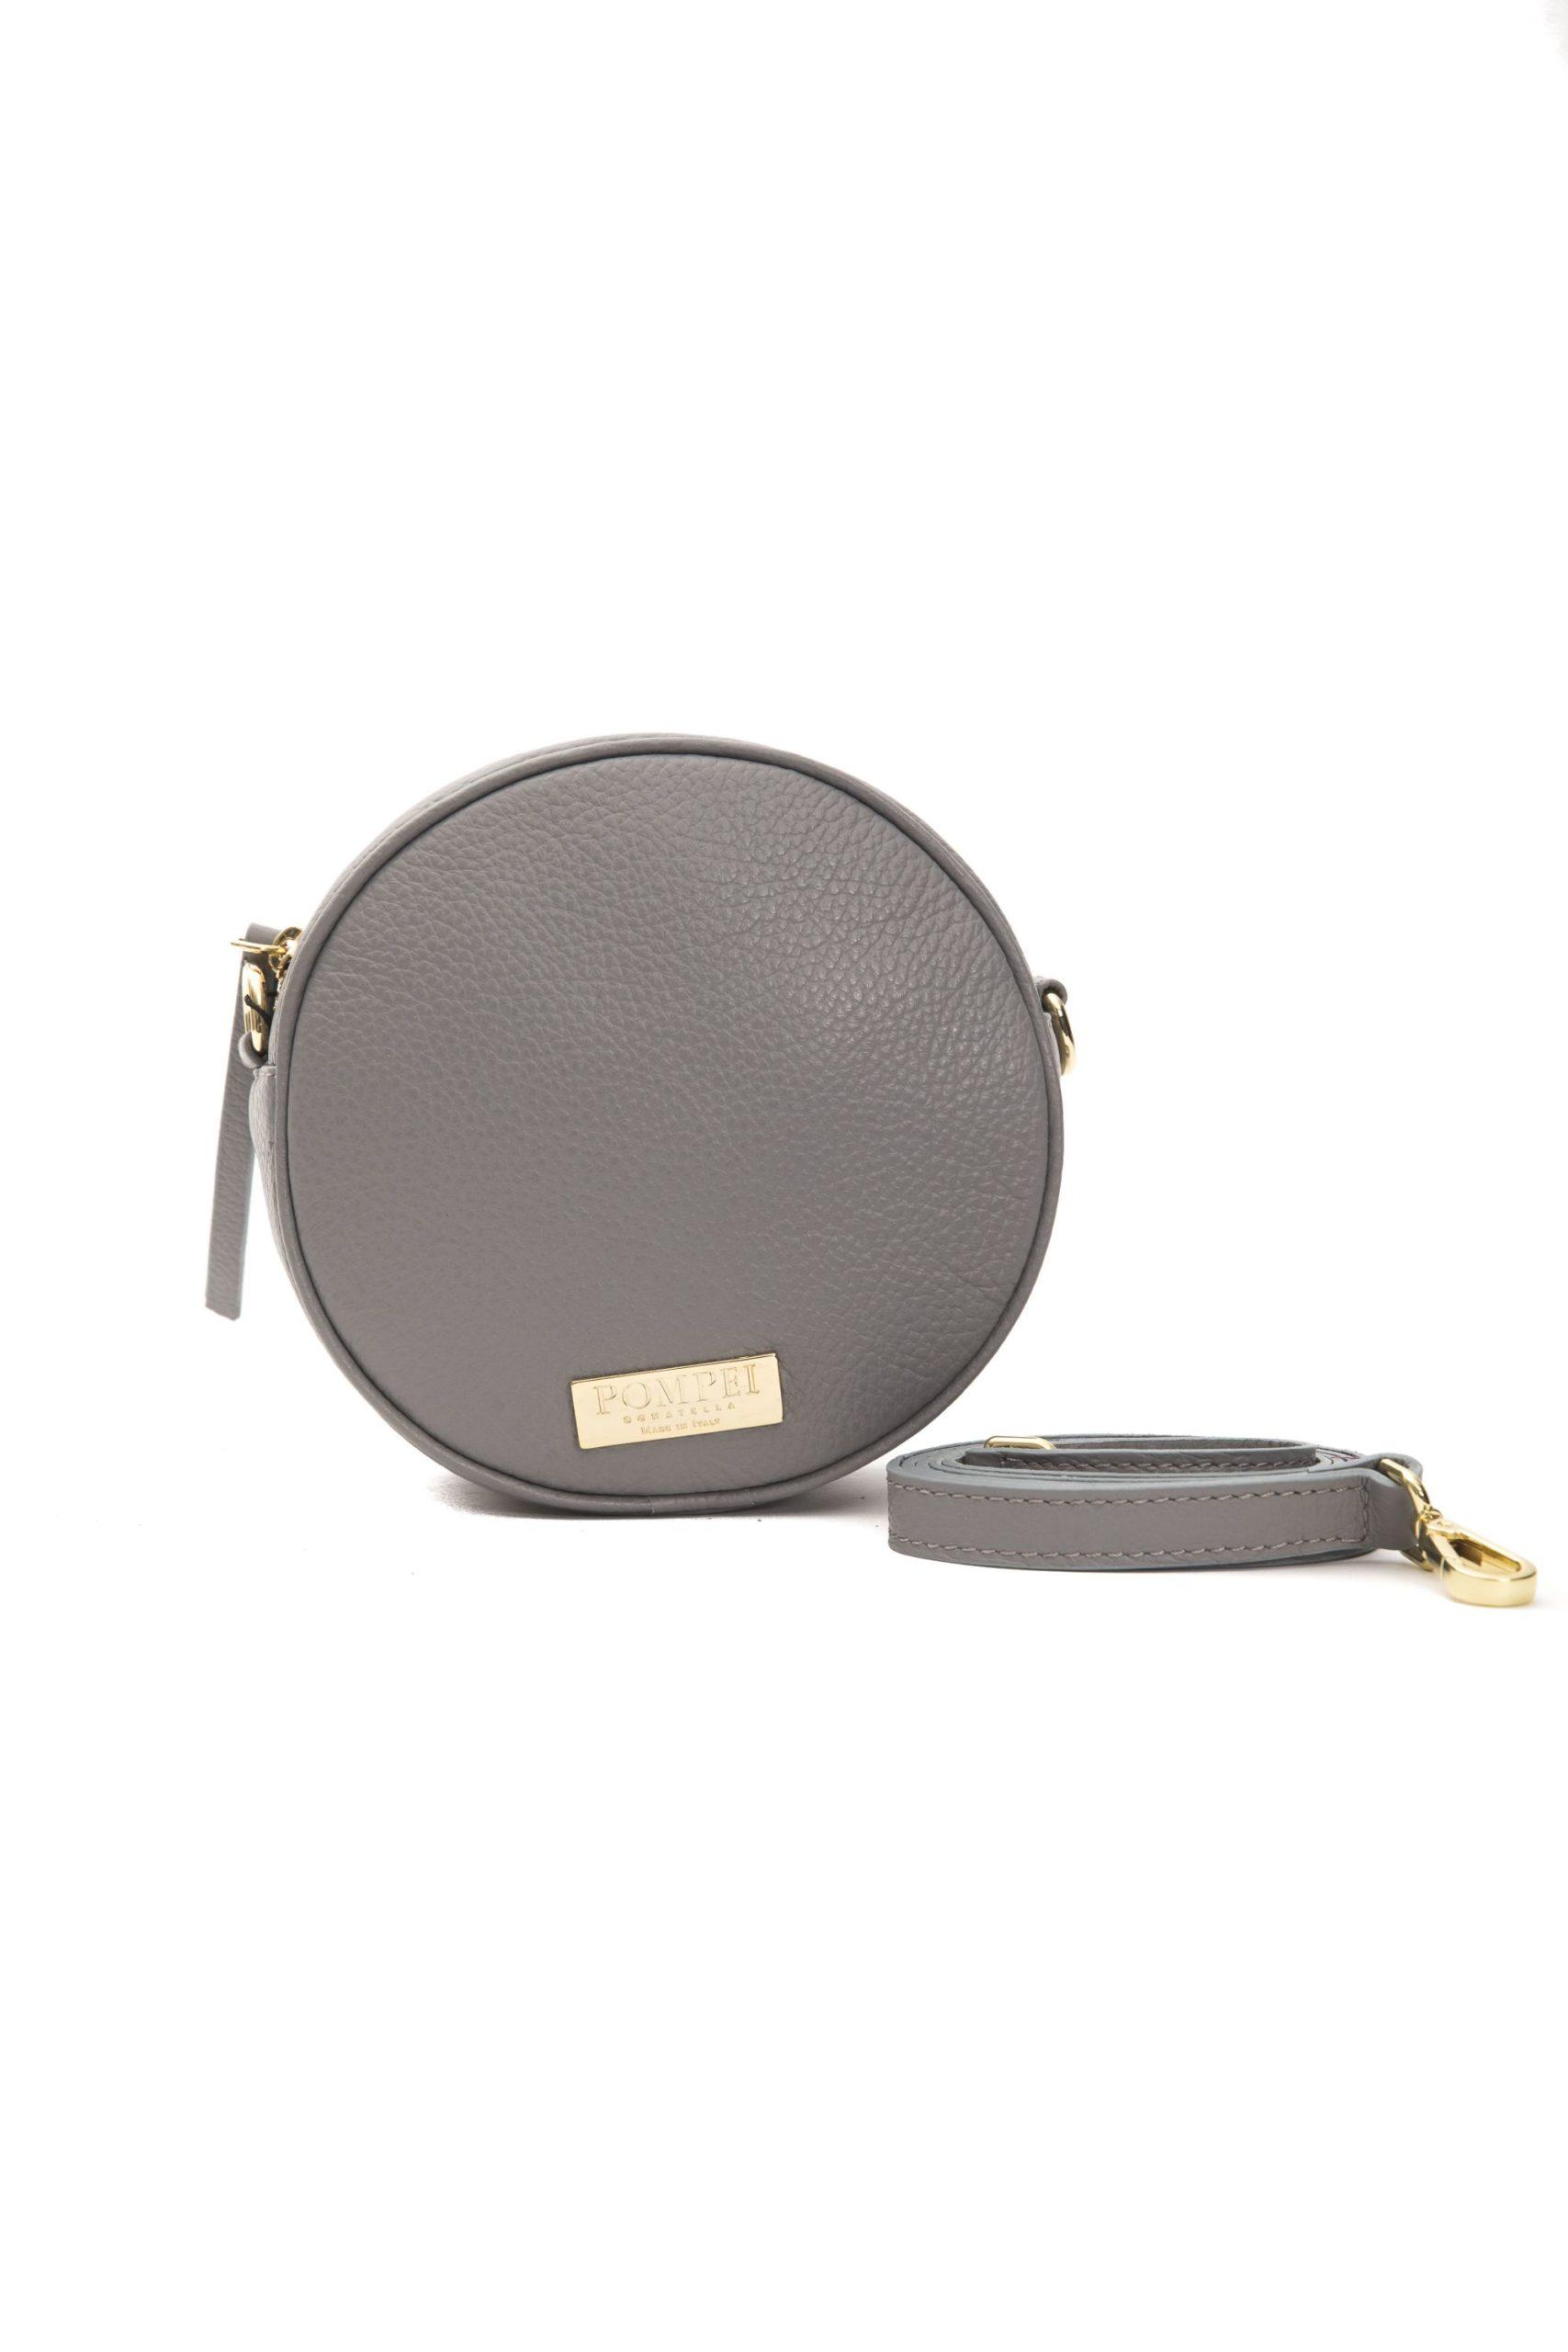 Pompei Donatella Women's Grigio Crossbody Bag Grey PO1004167